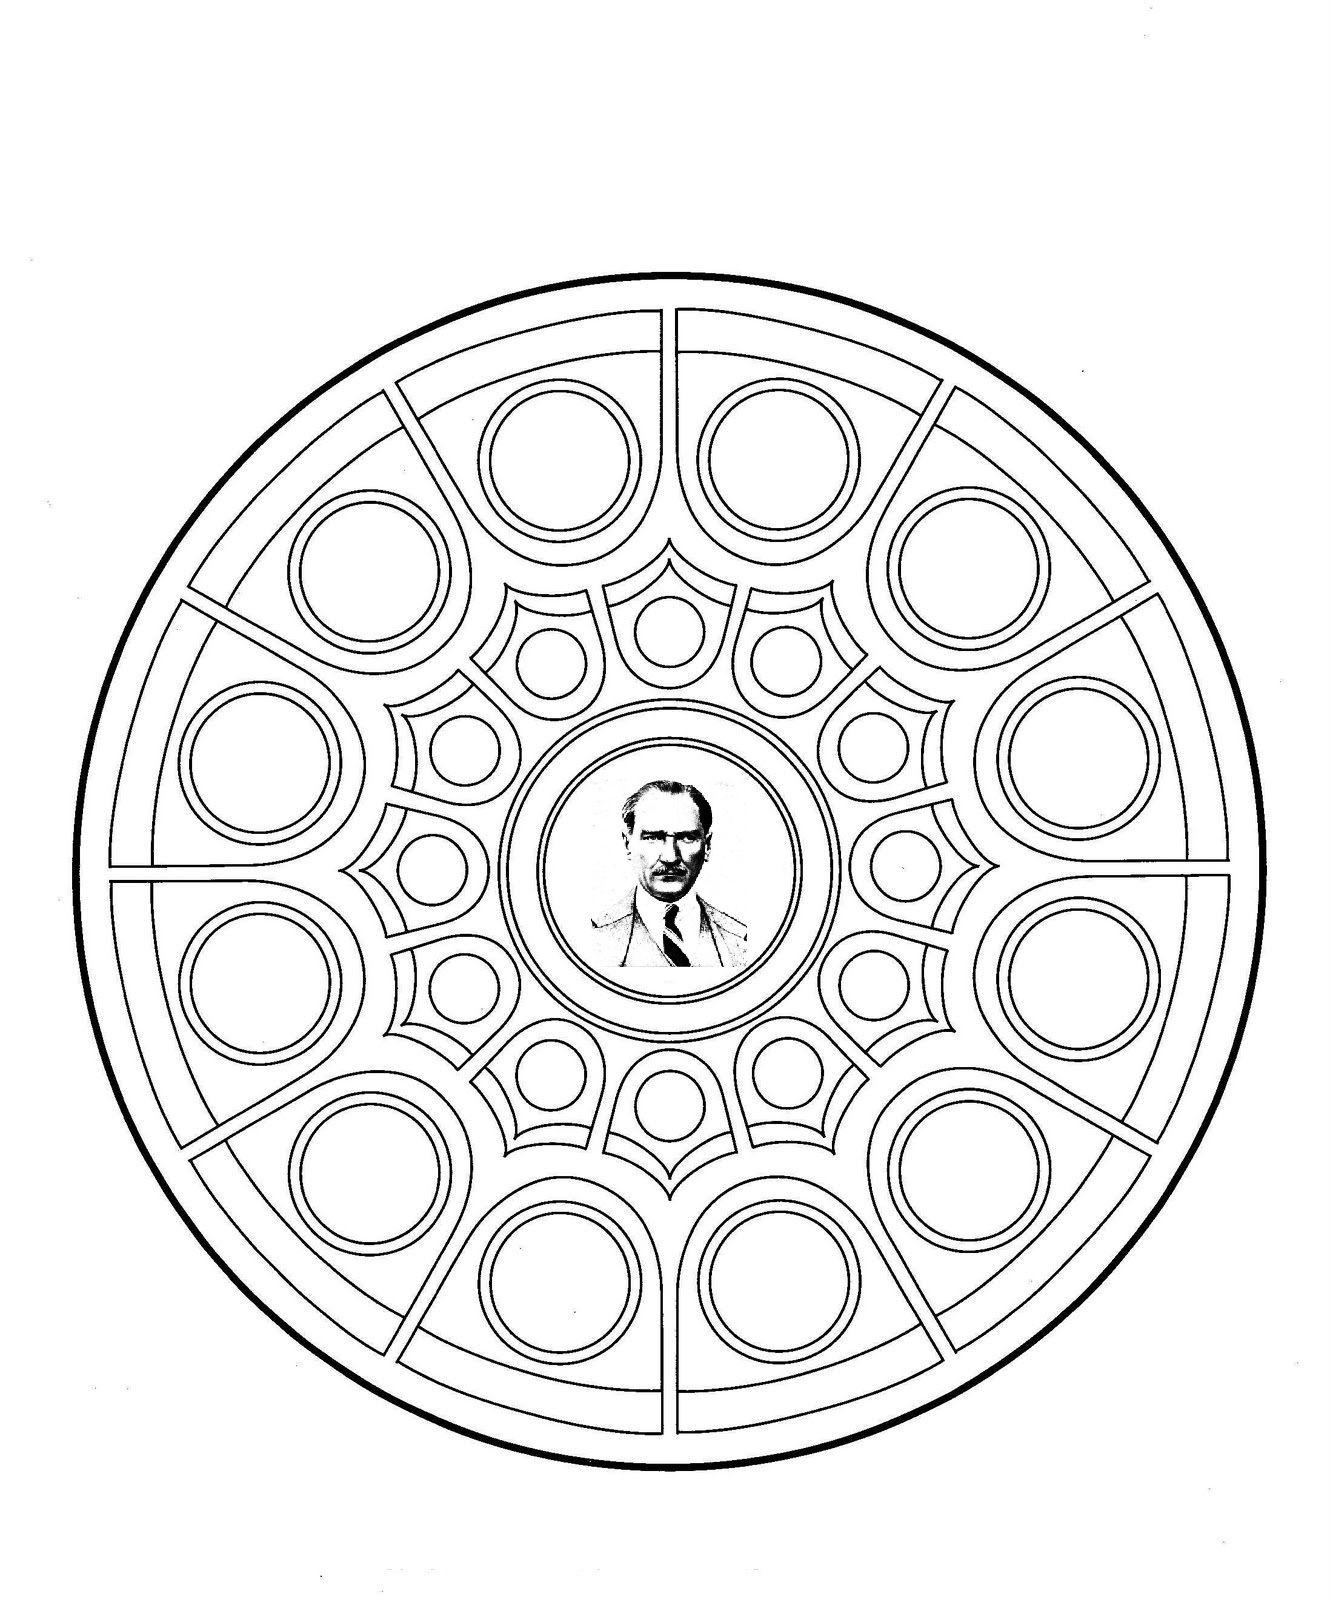 Mandala Coloring Book Youtube Krita Mandala 18 By Welshpixie On